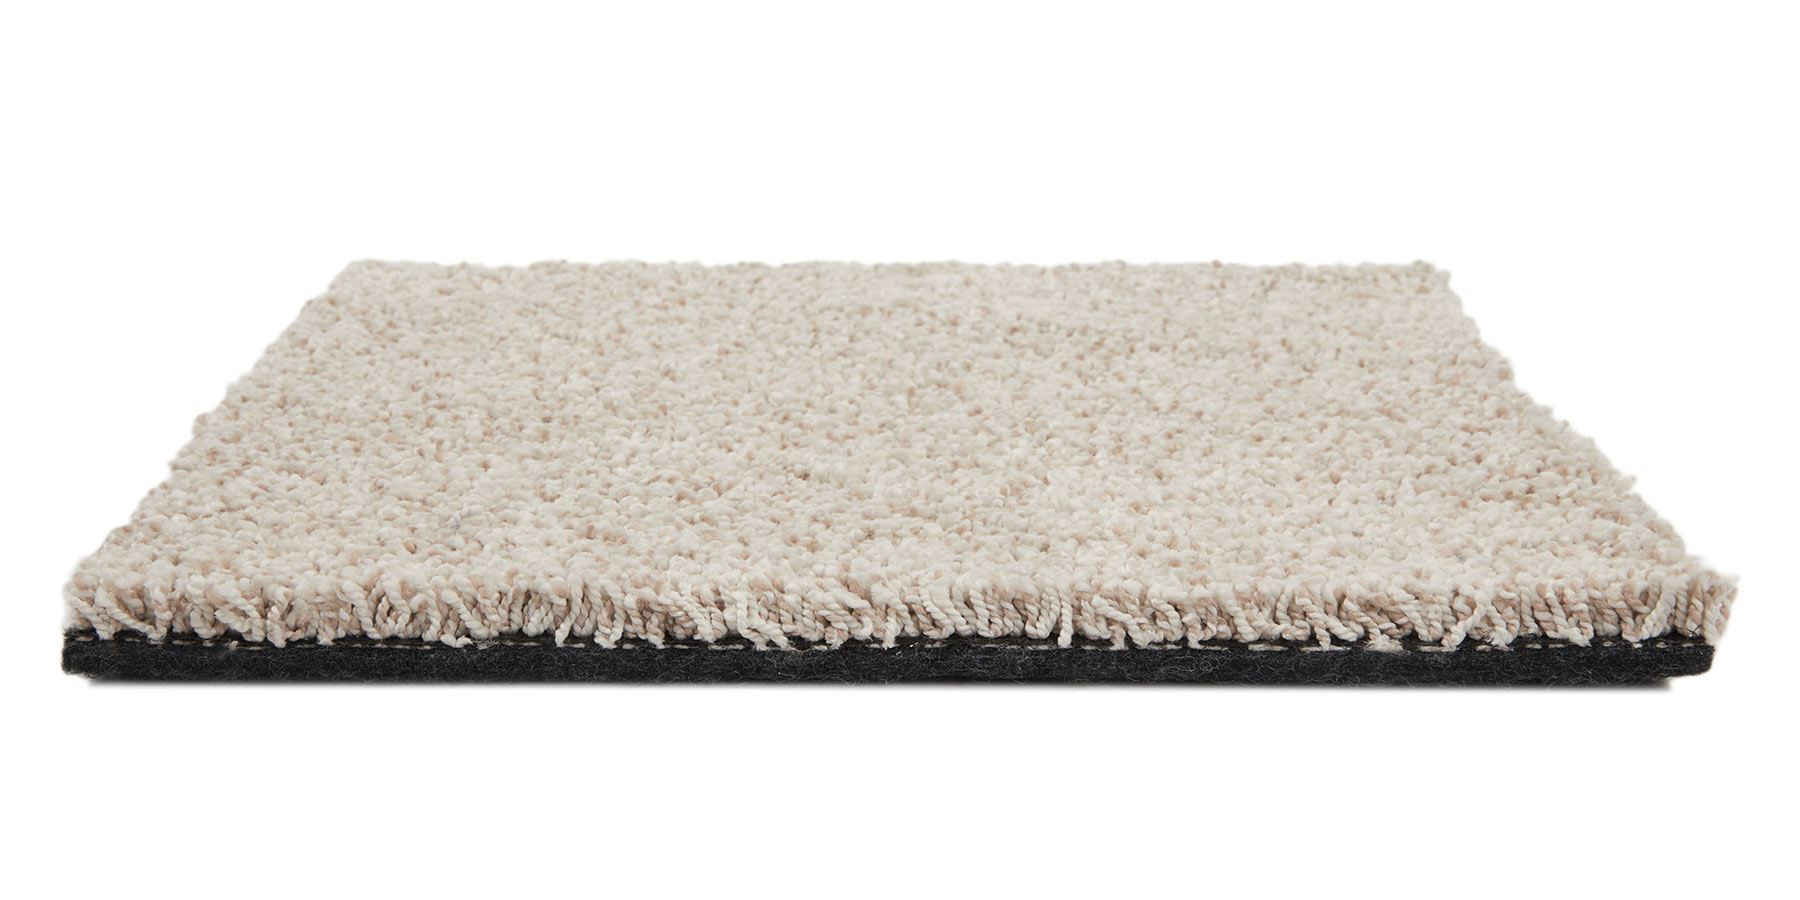 Incomparable Sphinx Carpet